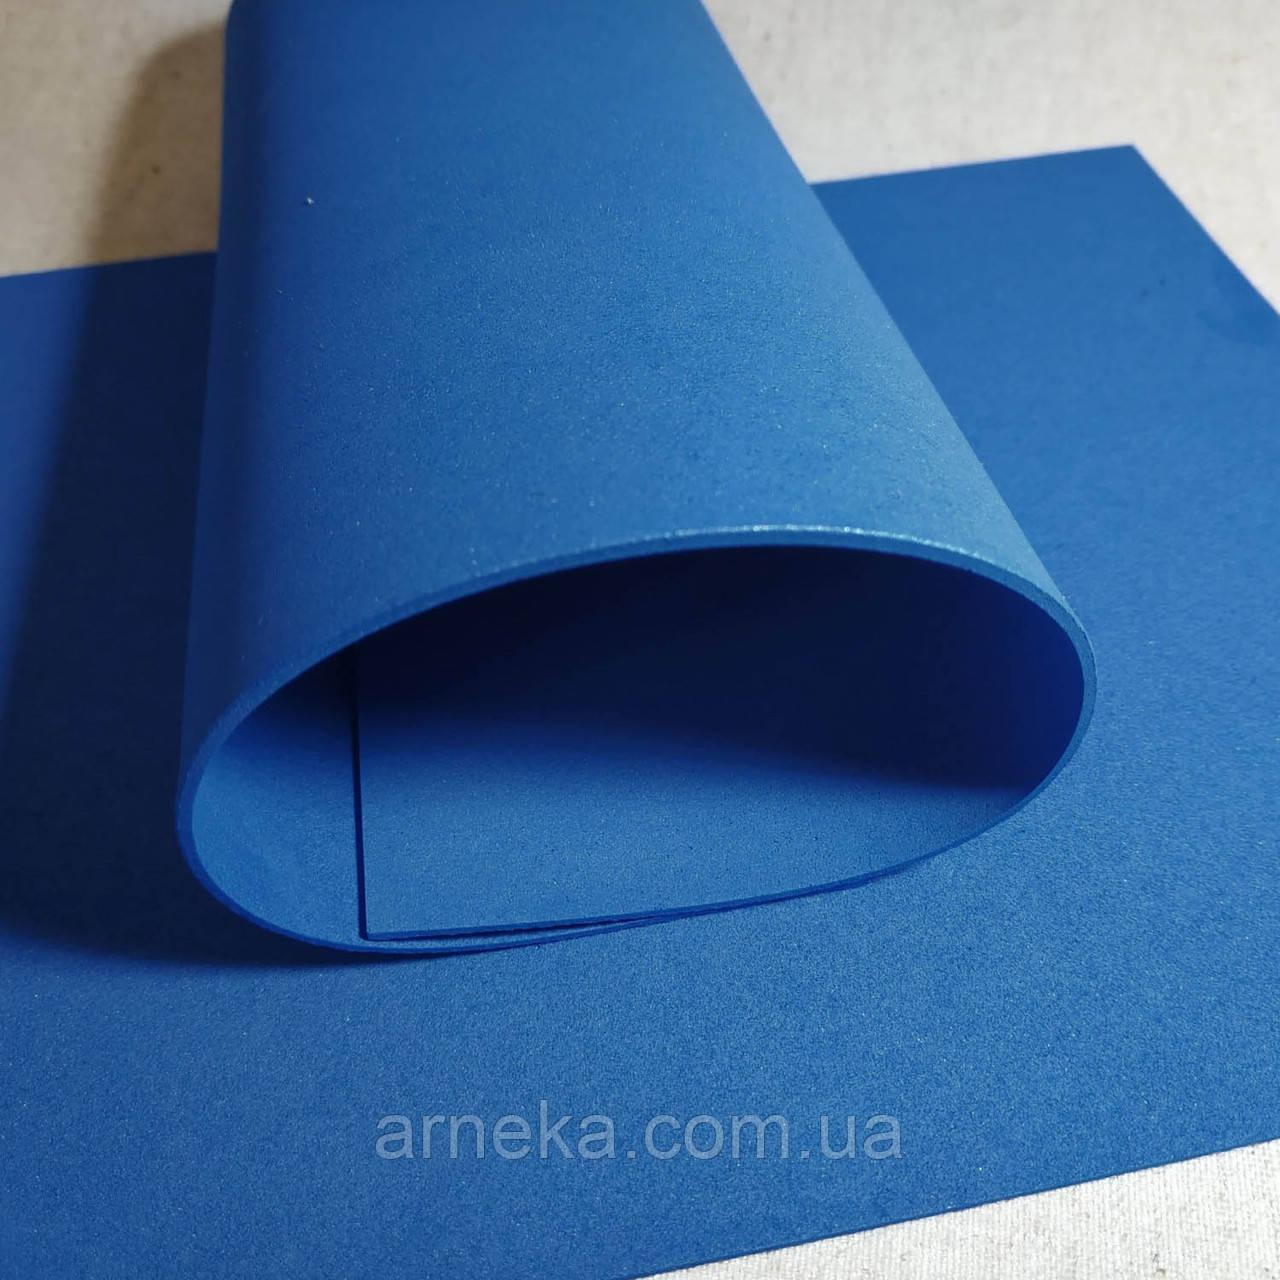 Фоамиран 20*30, толщина 2 мм (синий)